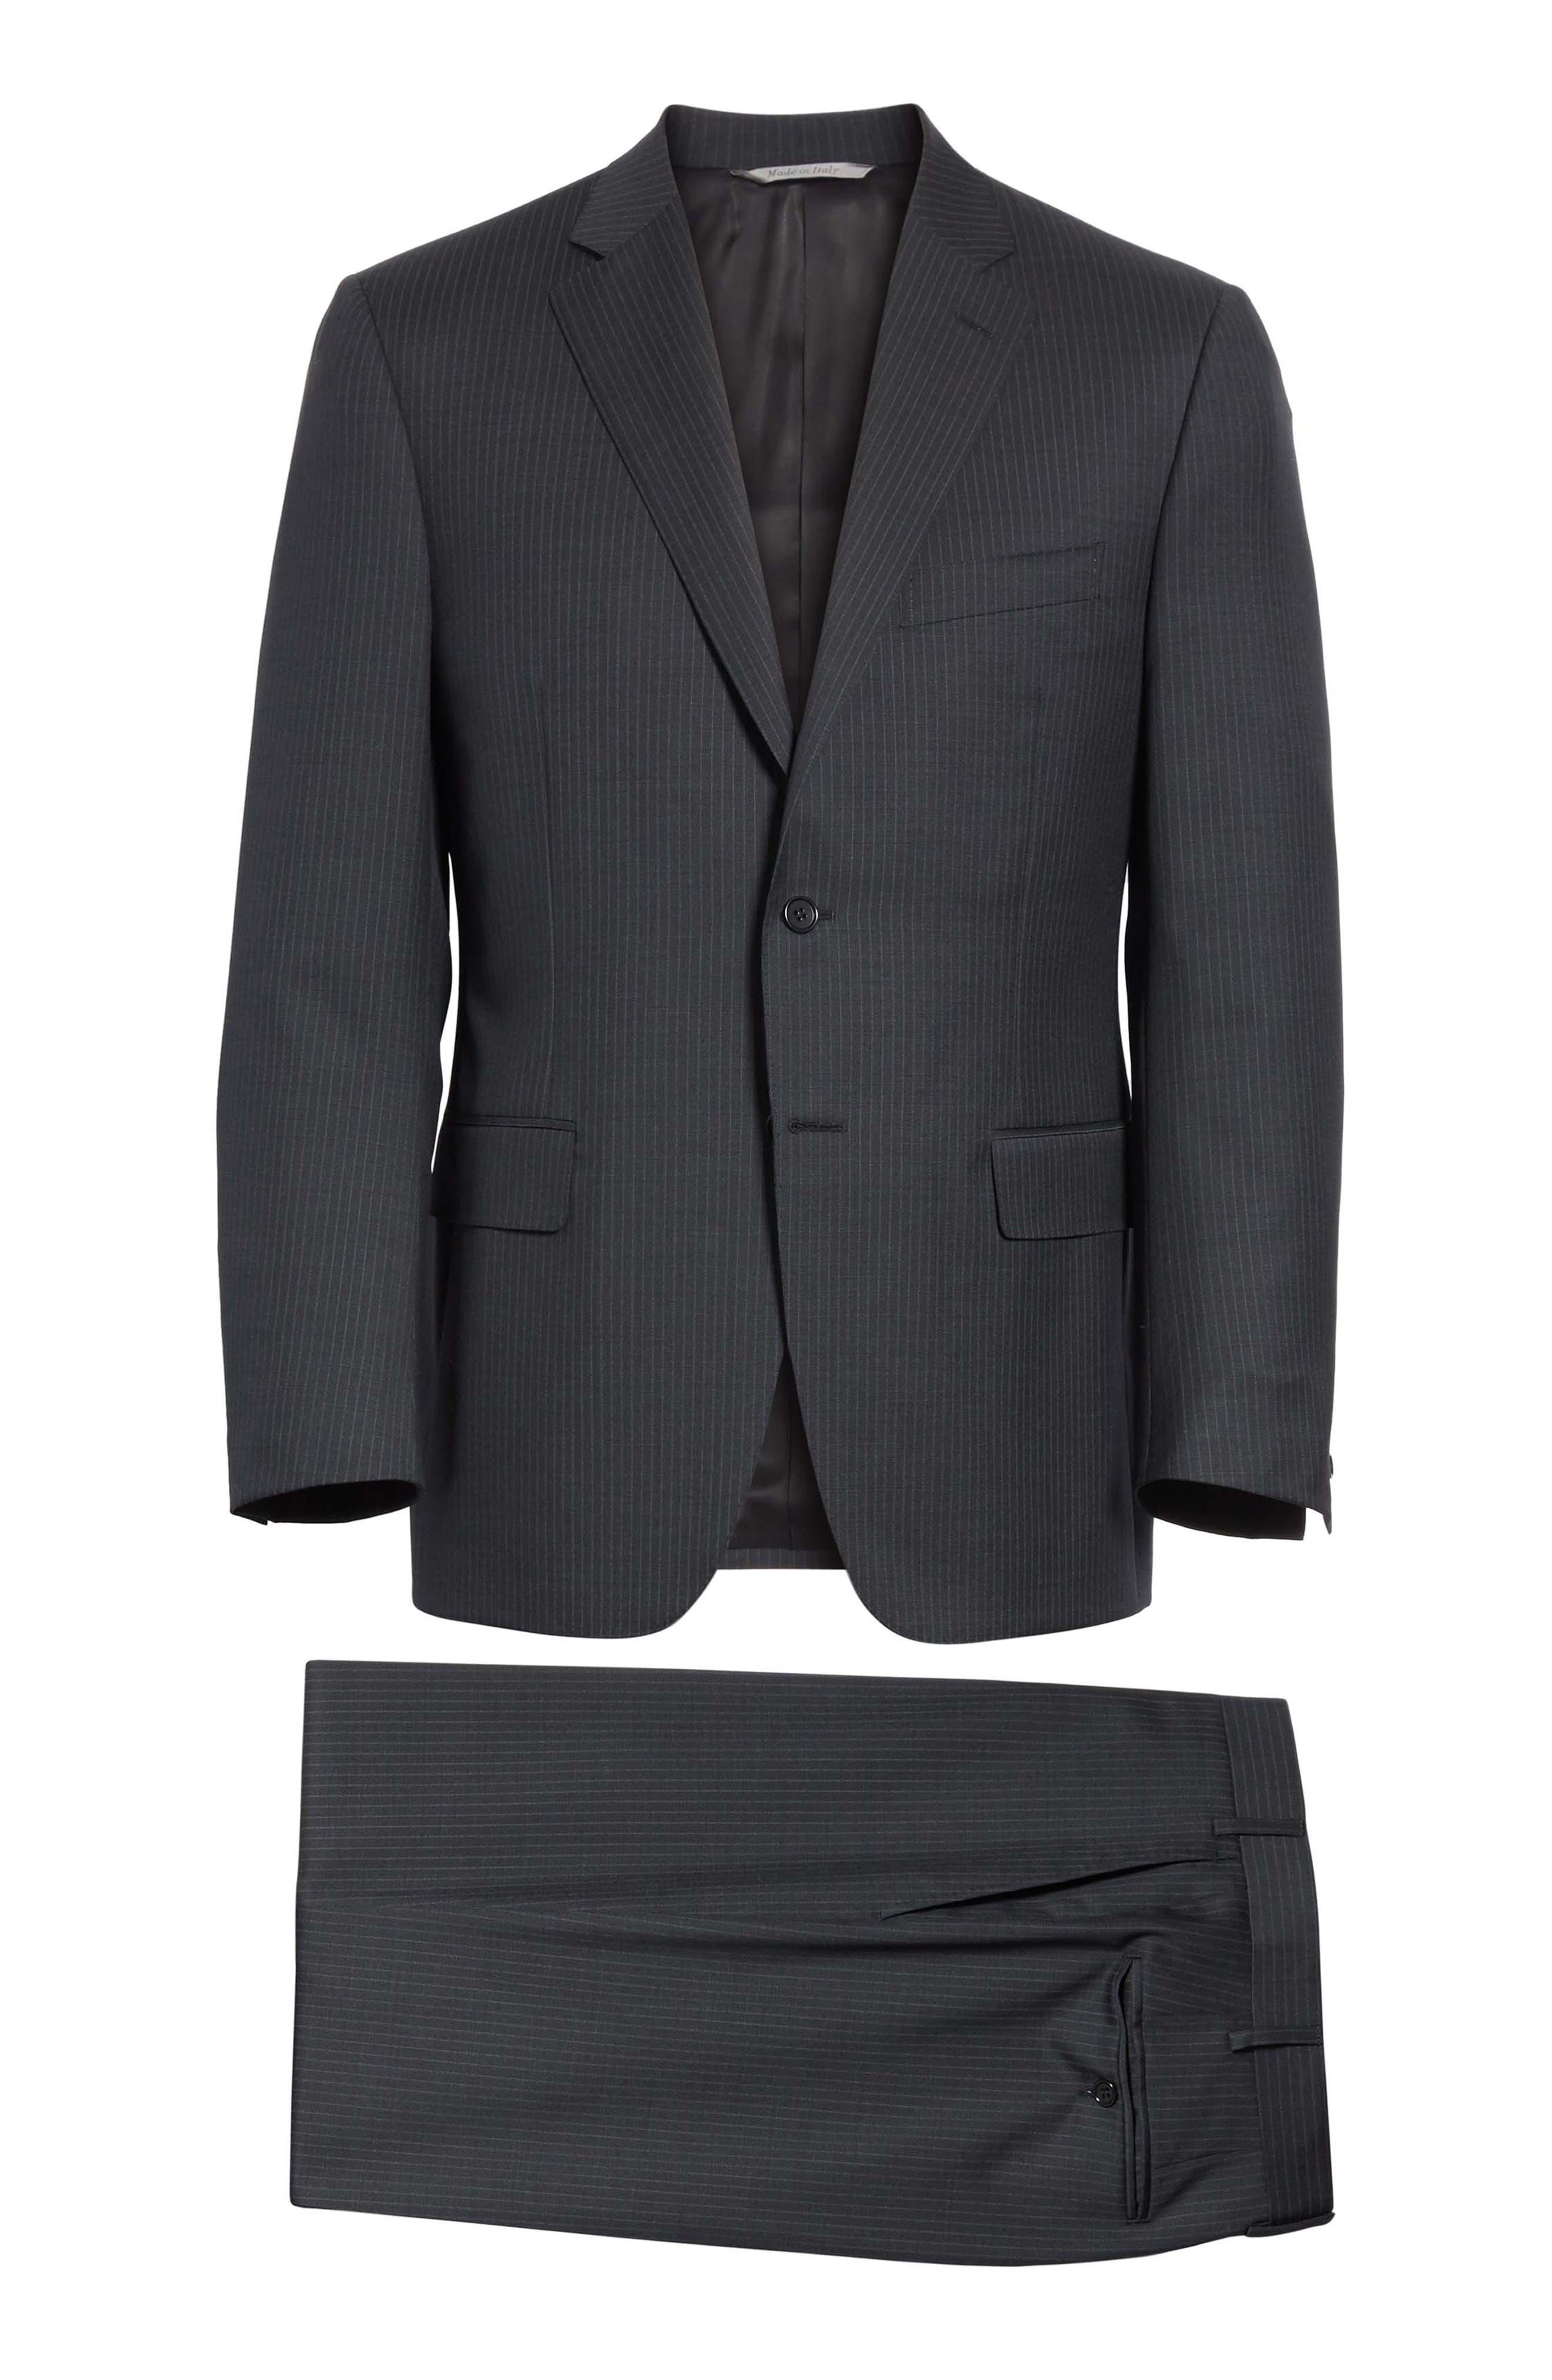 CANALI,                             Classic Fit Stripe Wool Suit,                             Alternate thumbnail 8, color,                             010